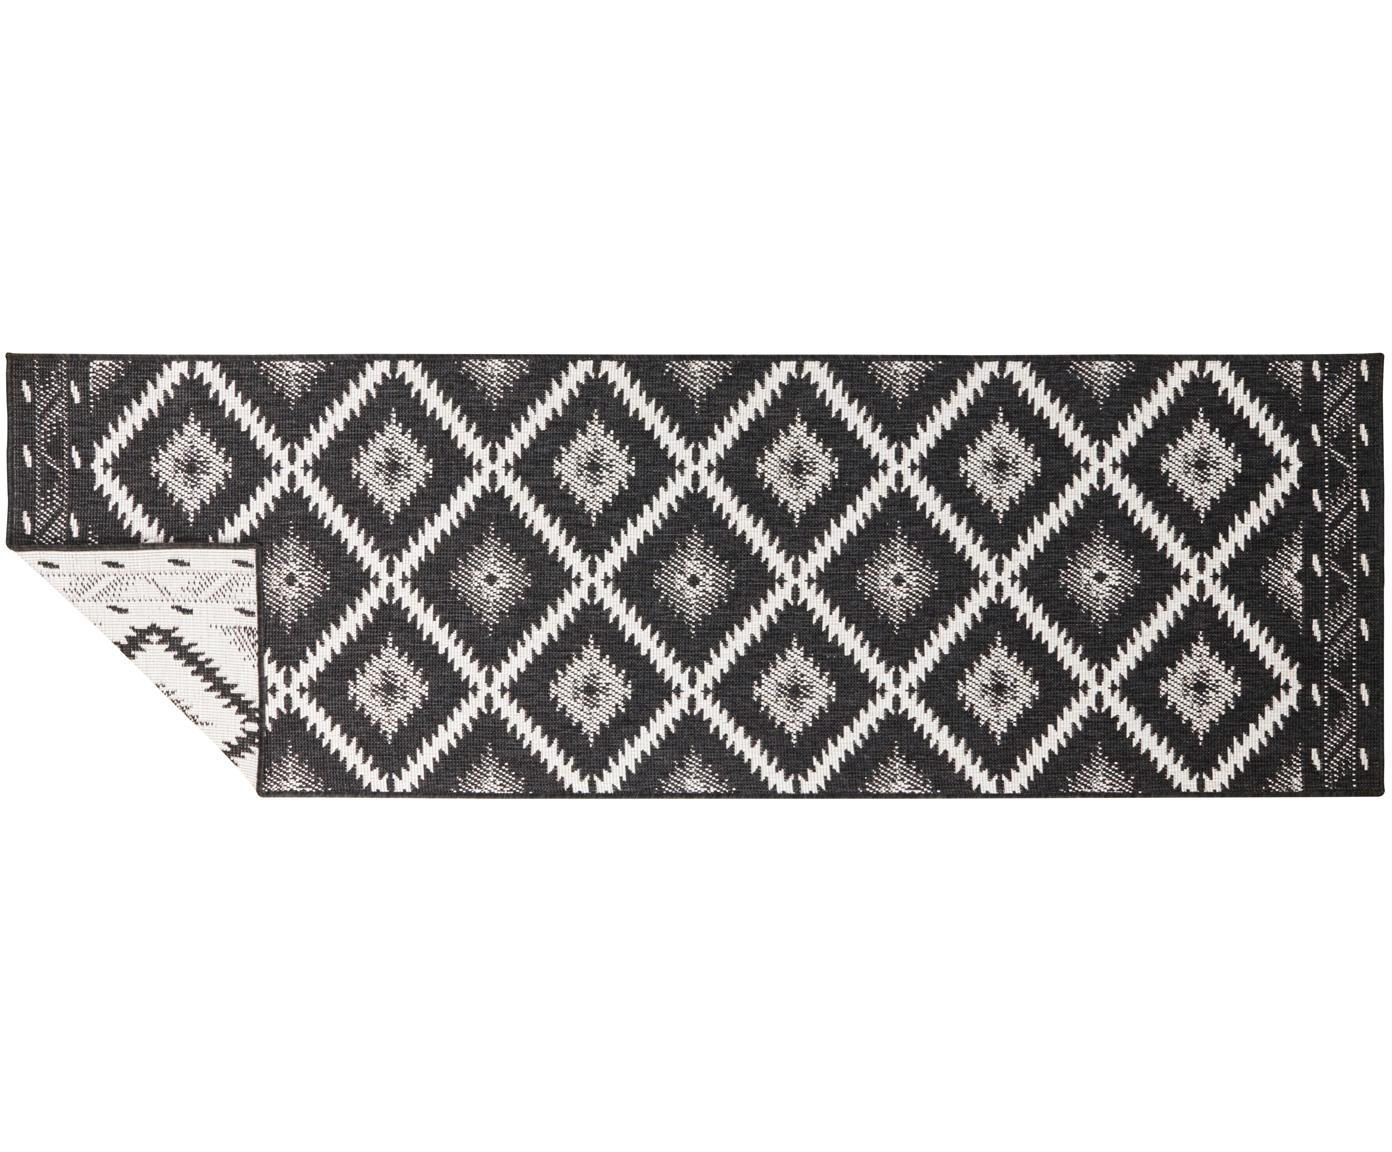 Dubbelzijdige in- & outdoor loper Malibu, Zwart, crèmekleurig, 80 x 250 cm